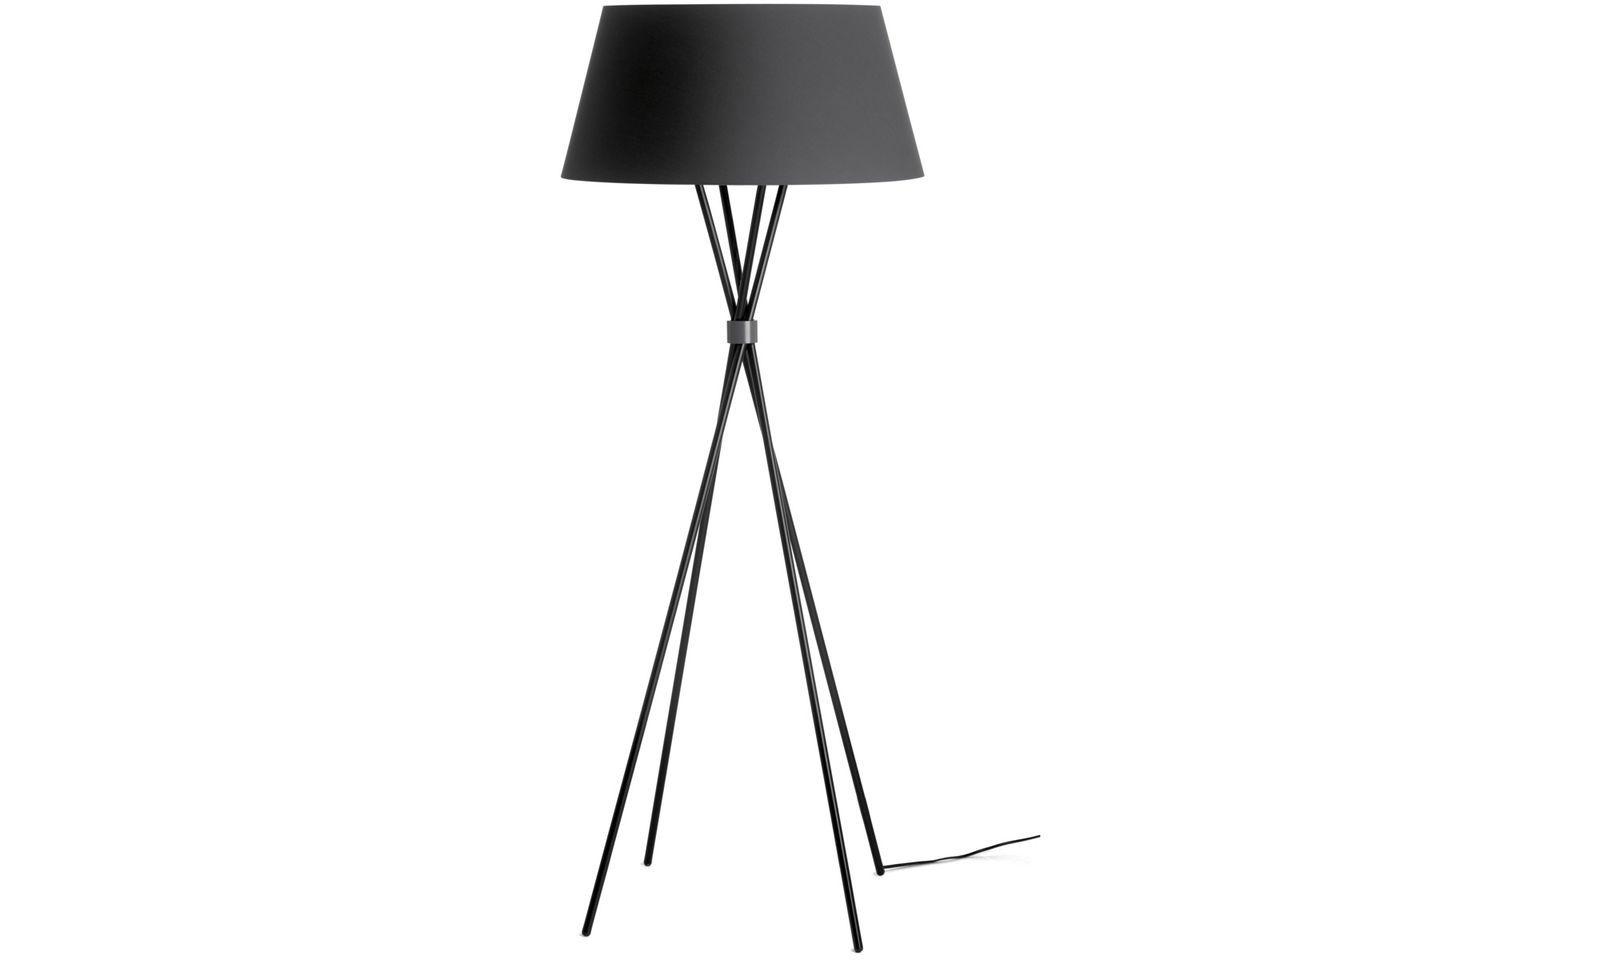 Lampen   Main vloerlamp   Vloerlamp, Lampenkap, Boconcept